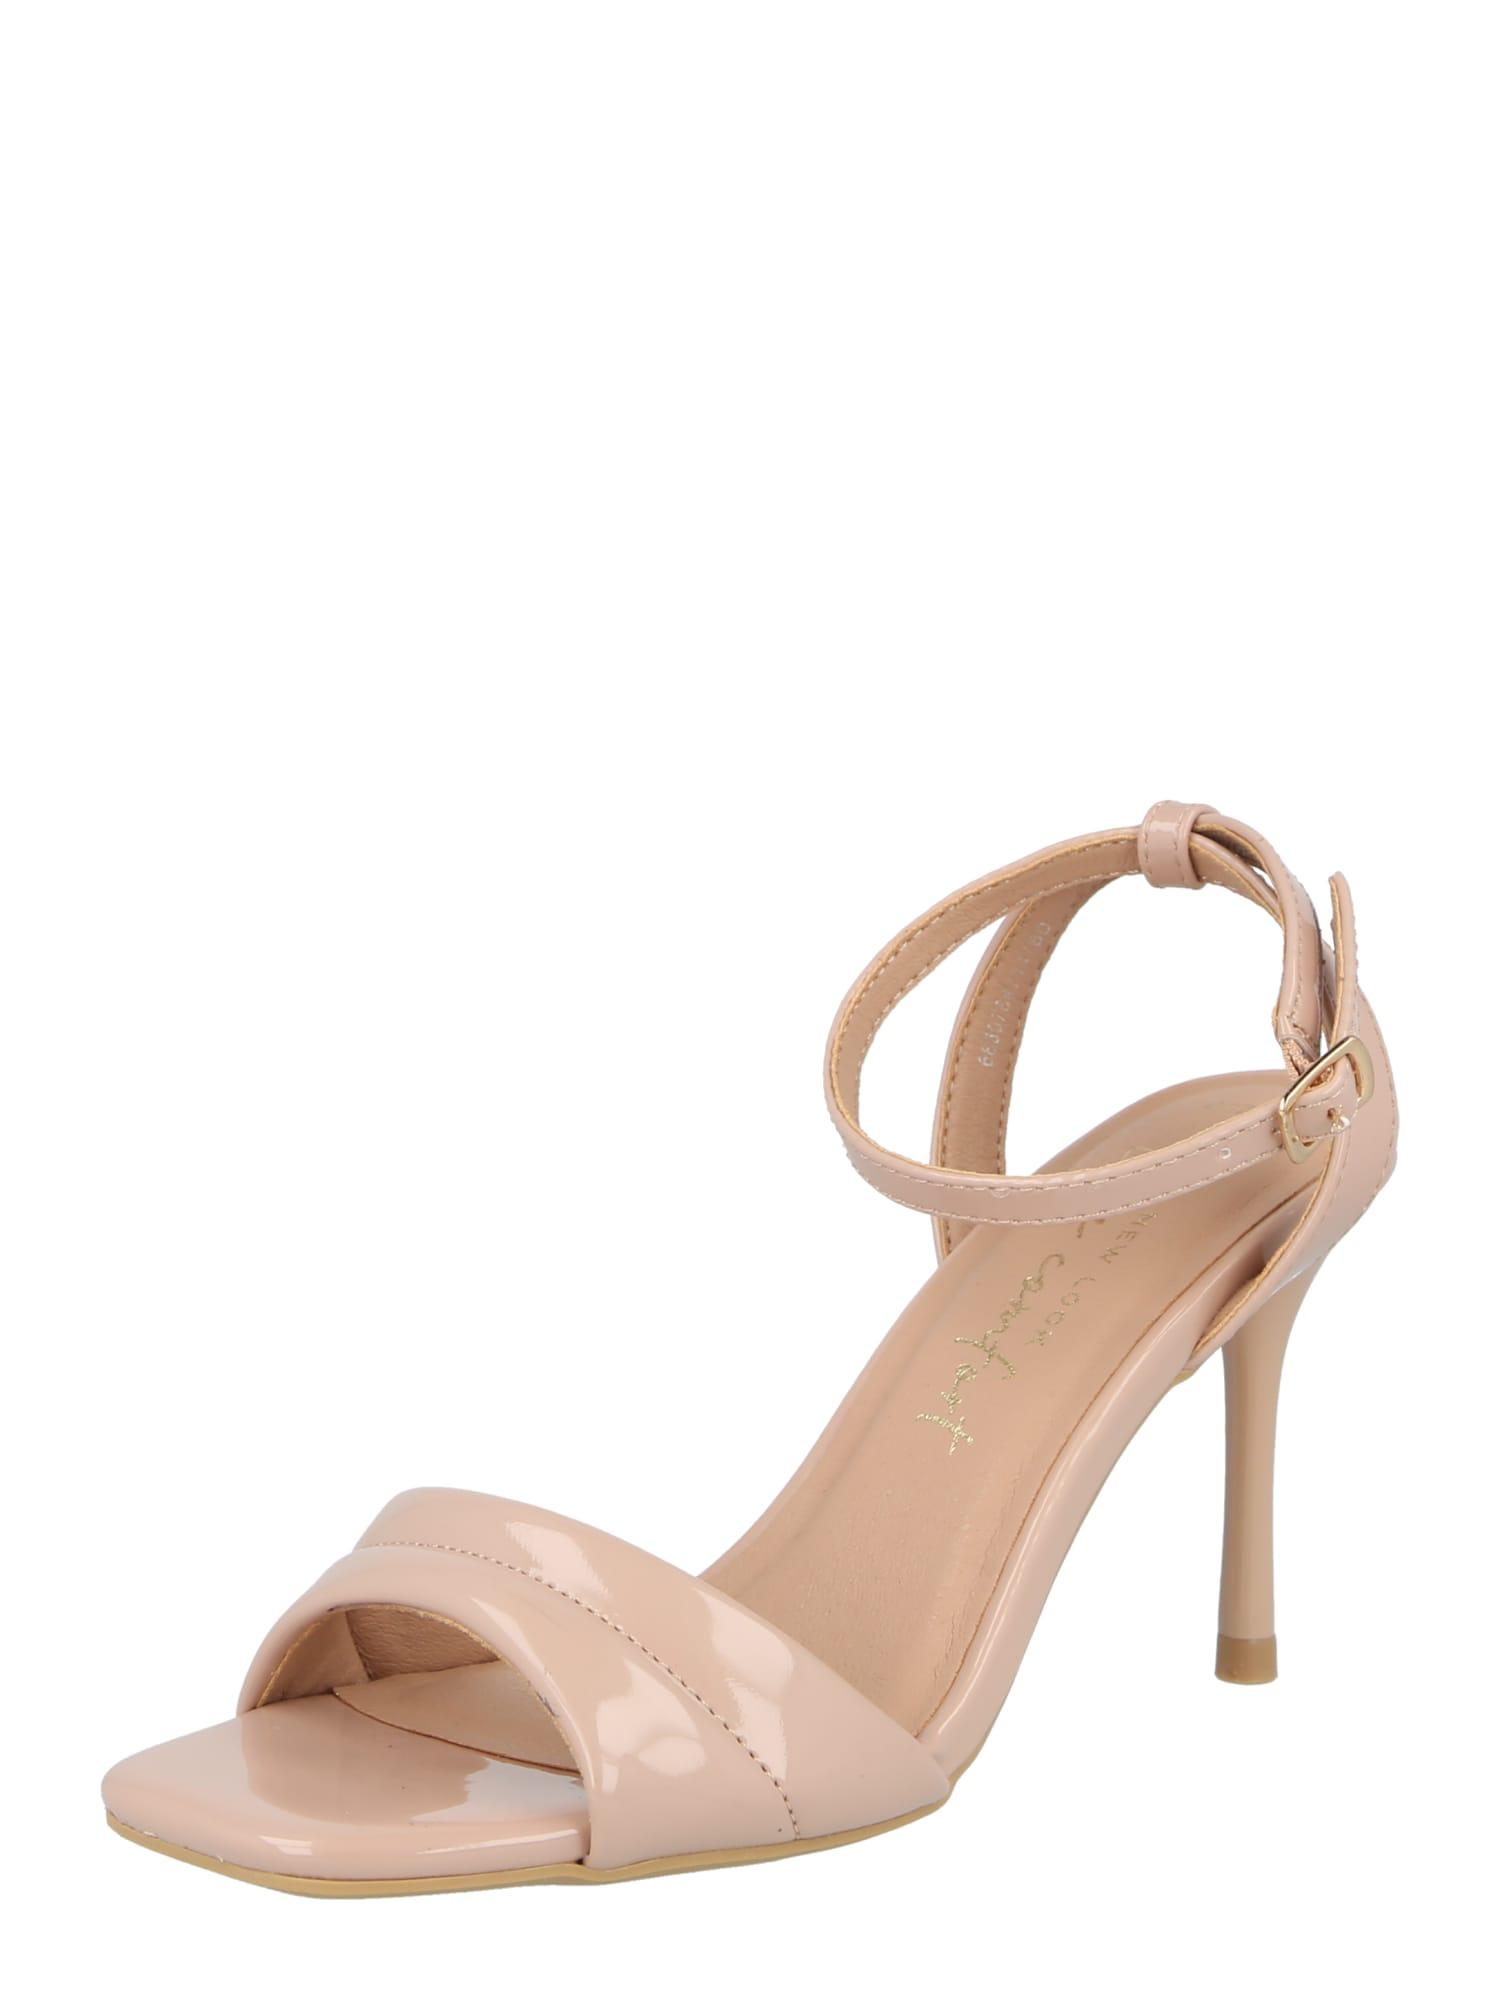 NEW LOOK Sandales à lanières 'VADDY'  - Beige - Taille: 8 - female